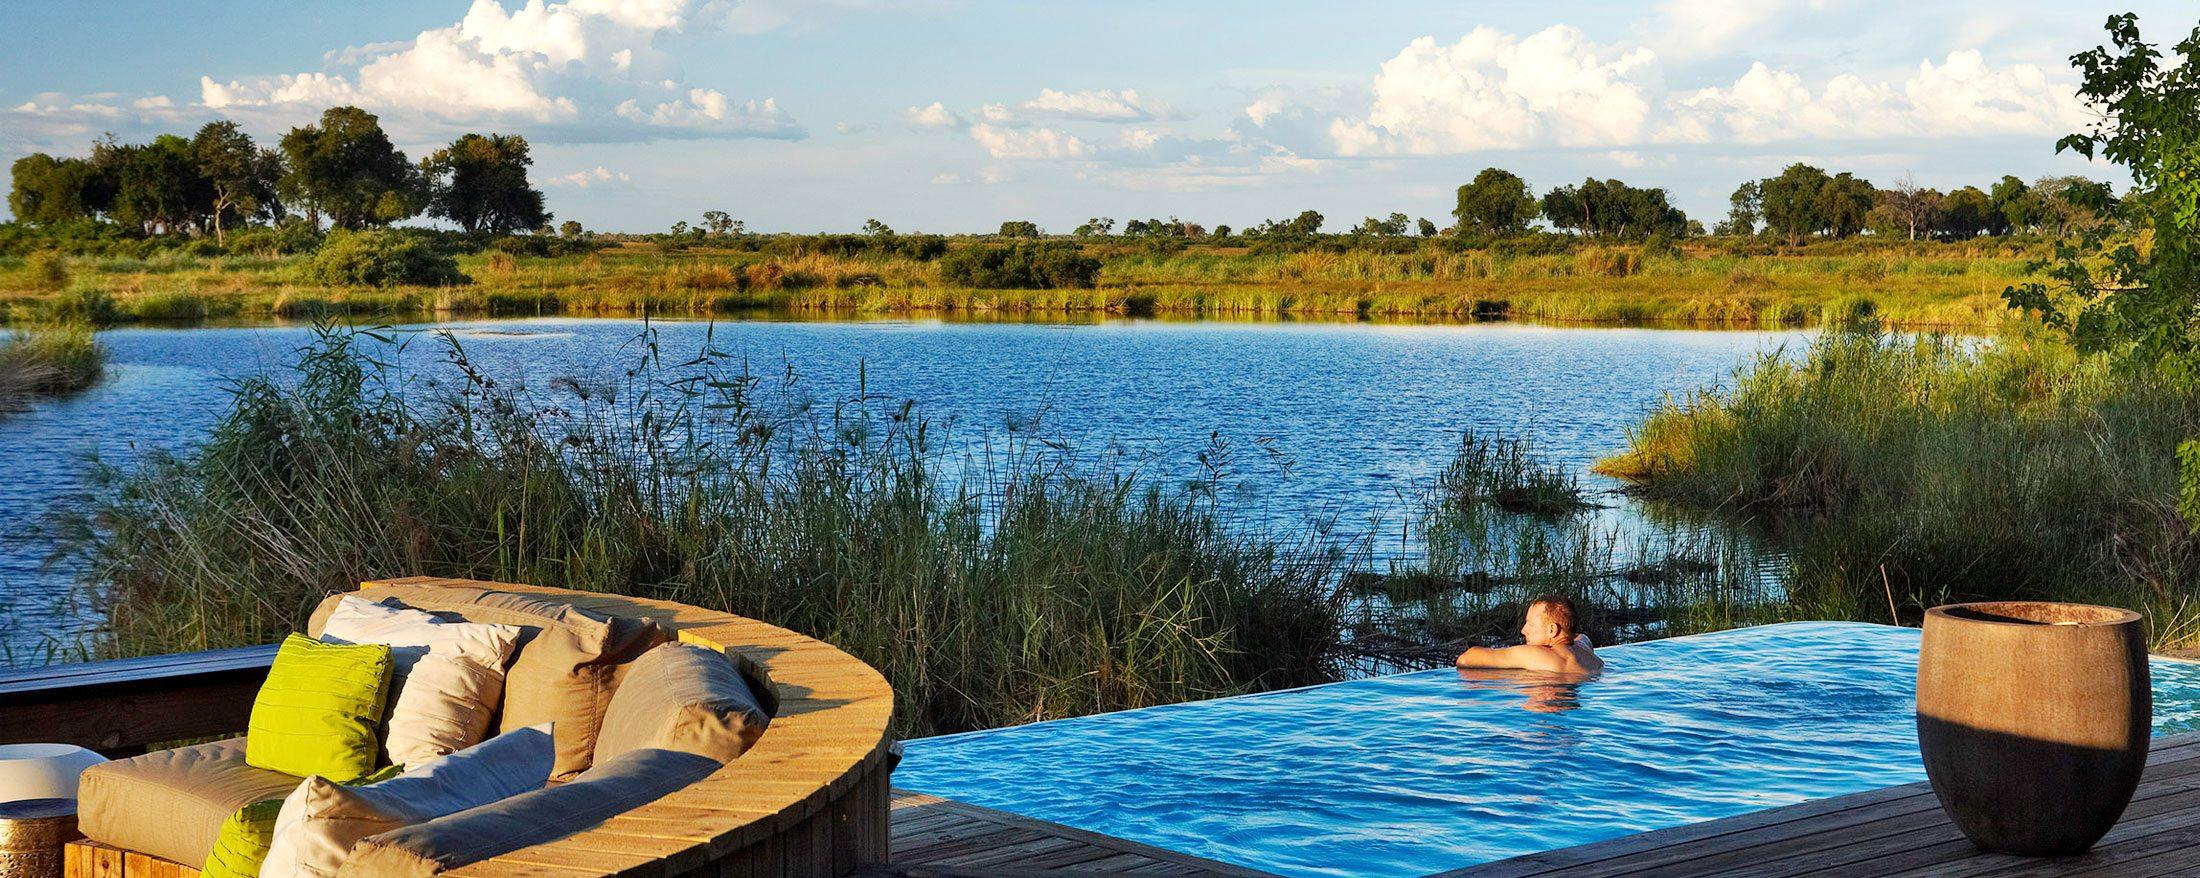 Kings Pool has a swimming pool overlooking the lagoon.